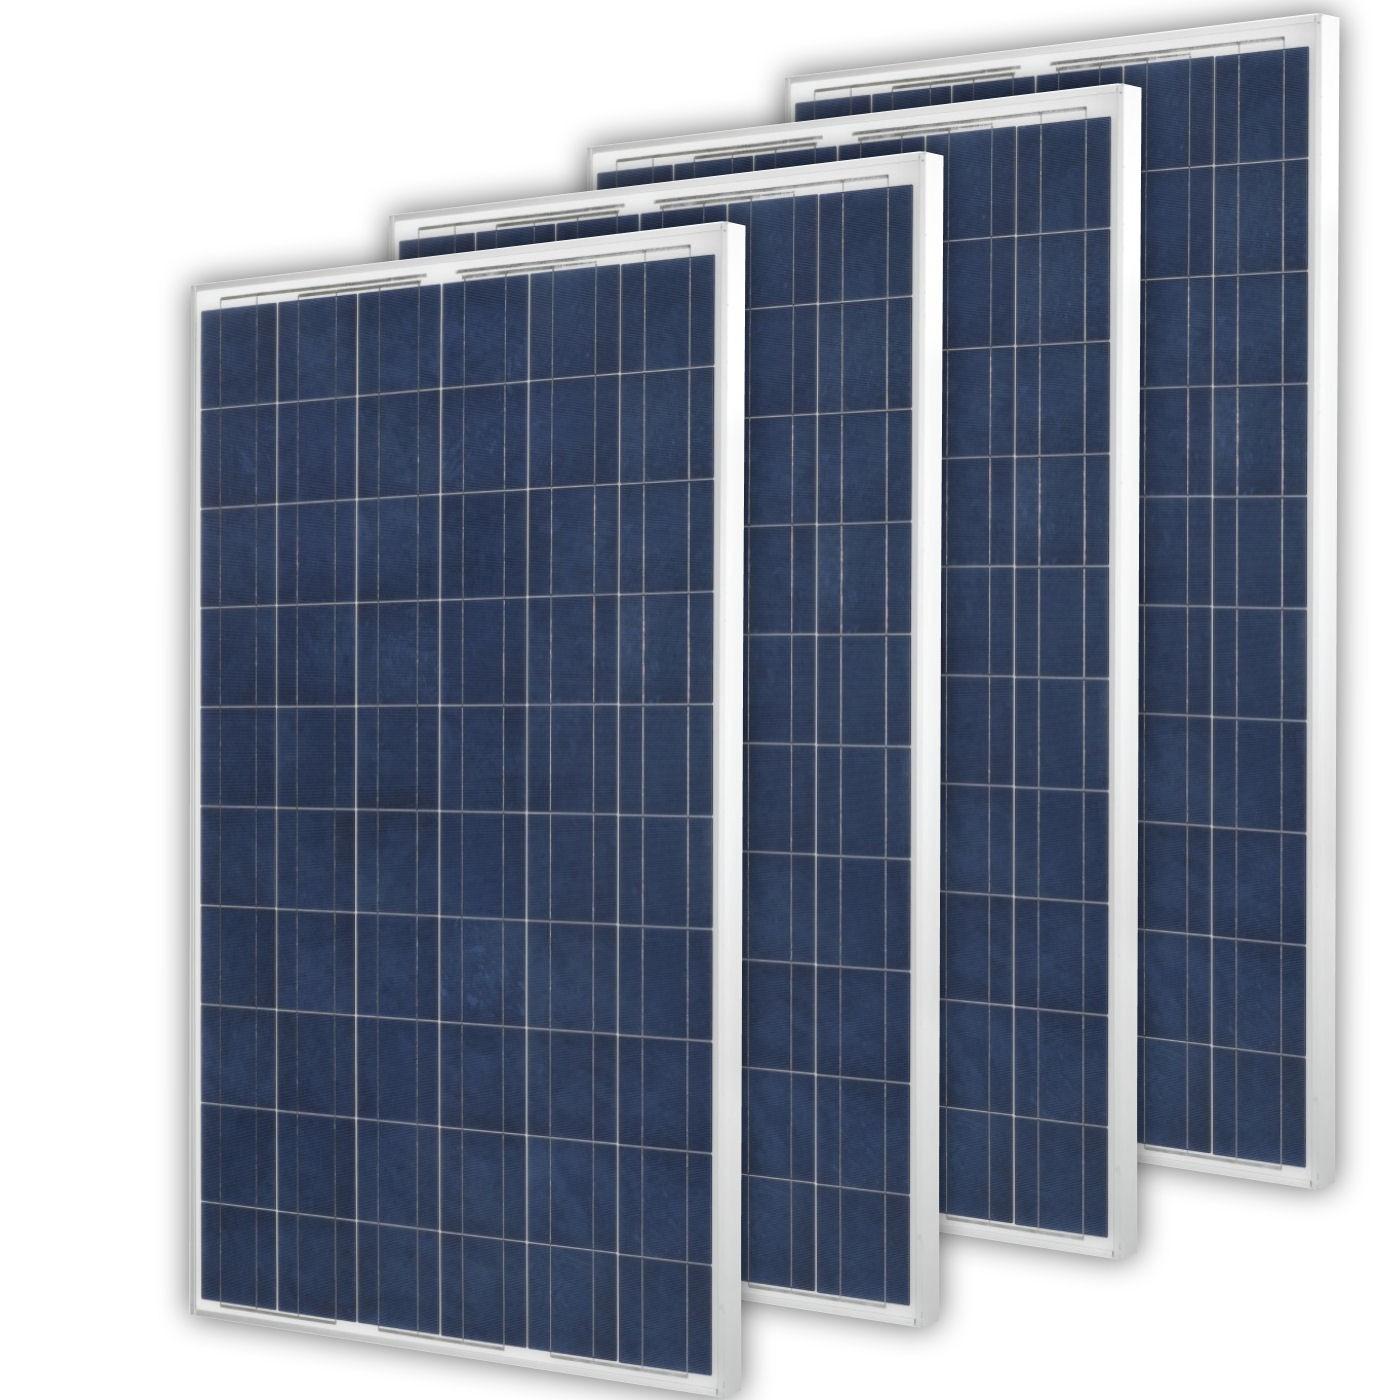 Solarpanel 4 x 250Watt Polykristallin Solarpanel Poly